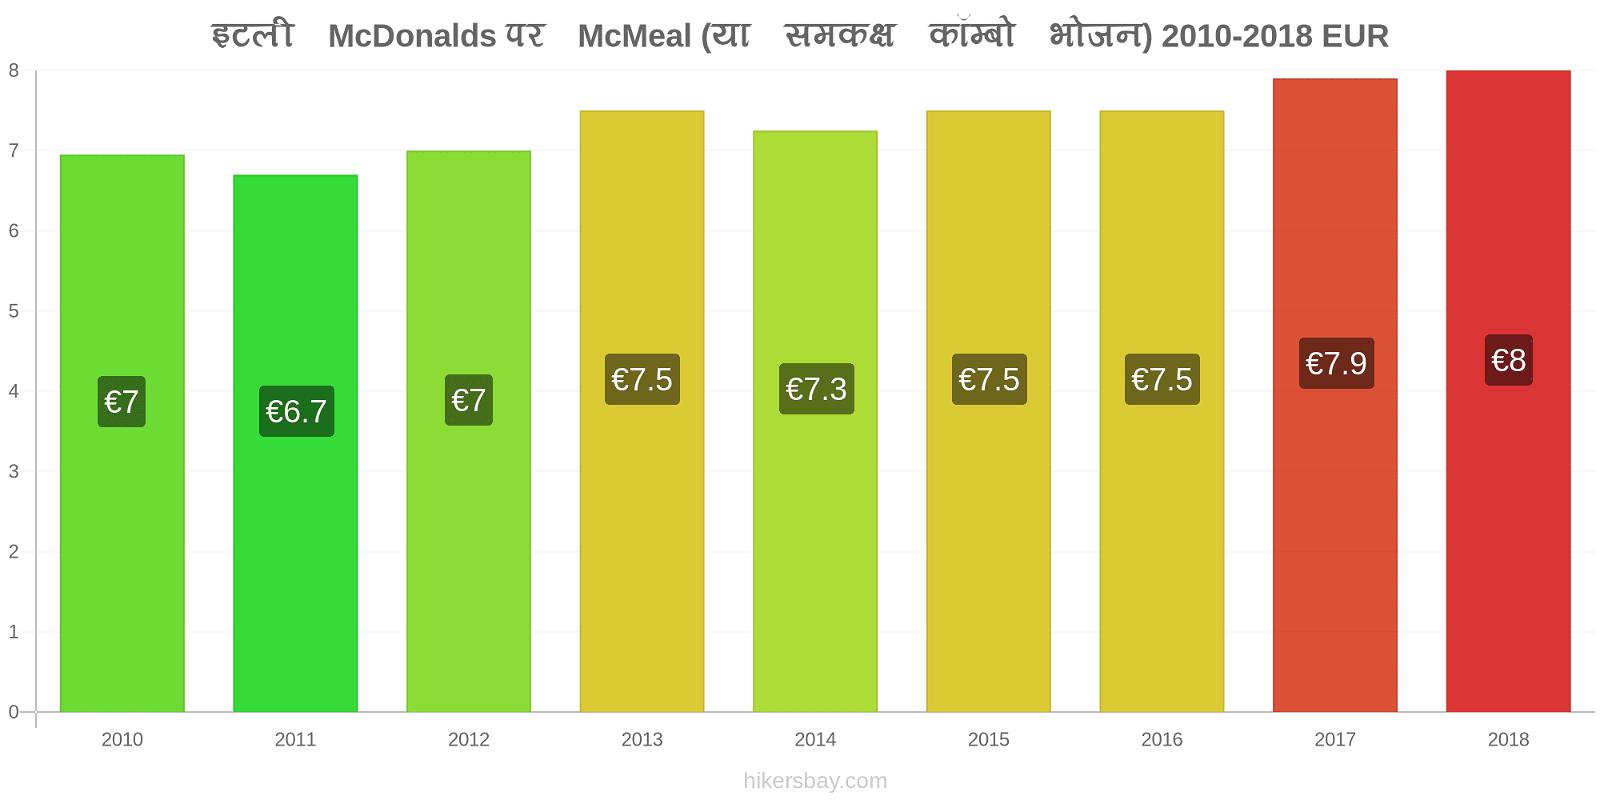 इटली मूल्य परिवर्तन McDonalds पर McMeal (या समकक्ष कॉम्बो भोजन) hikersbay.com